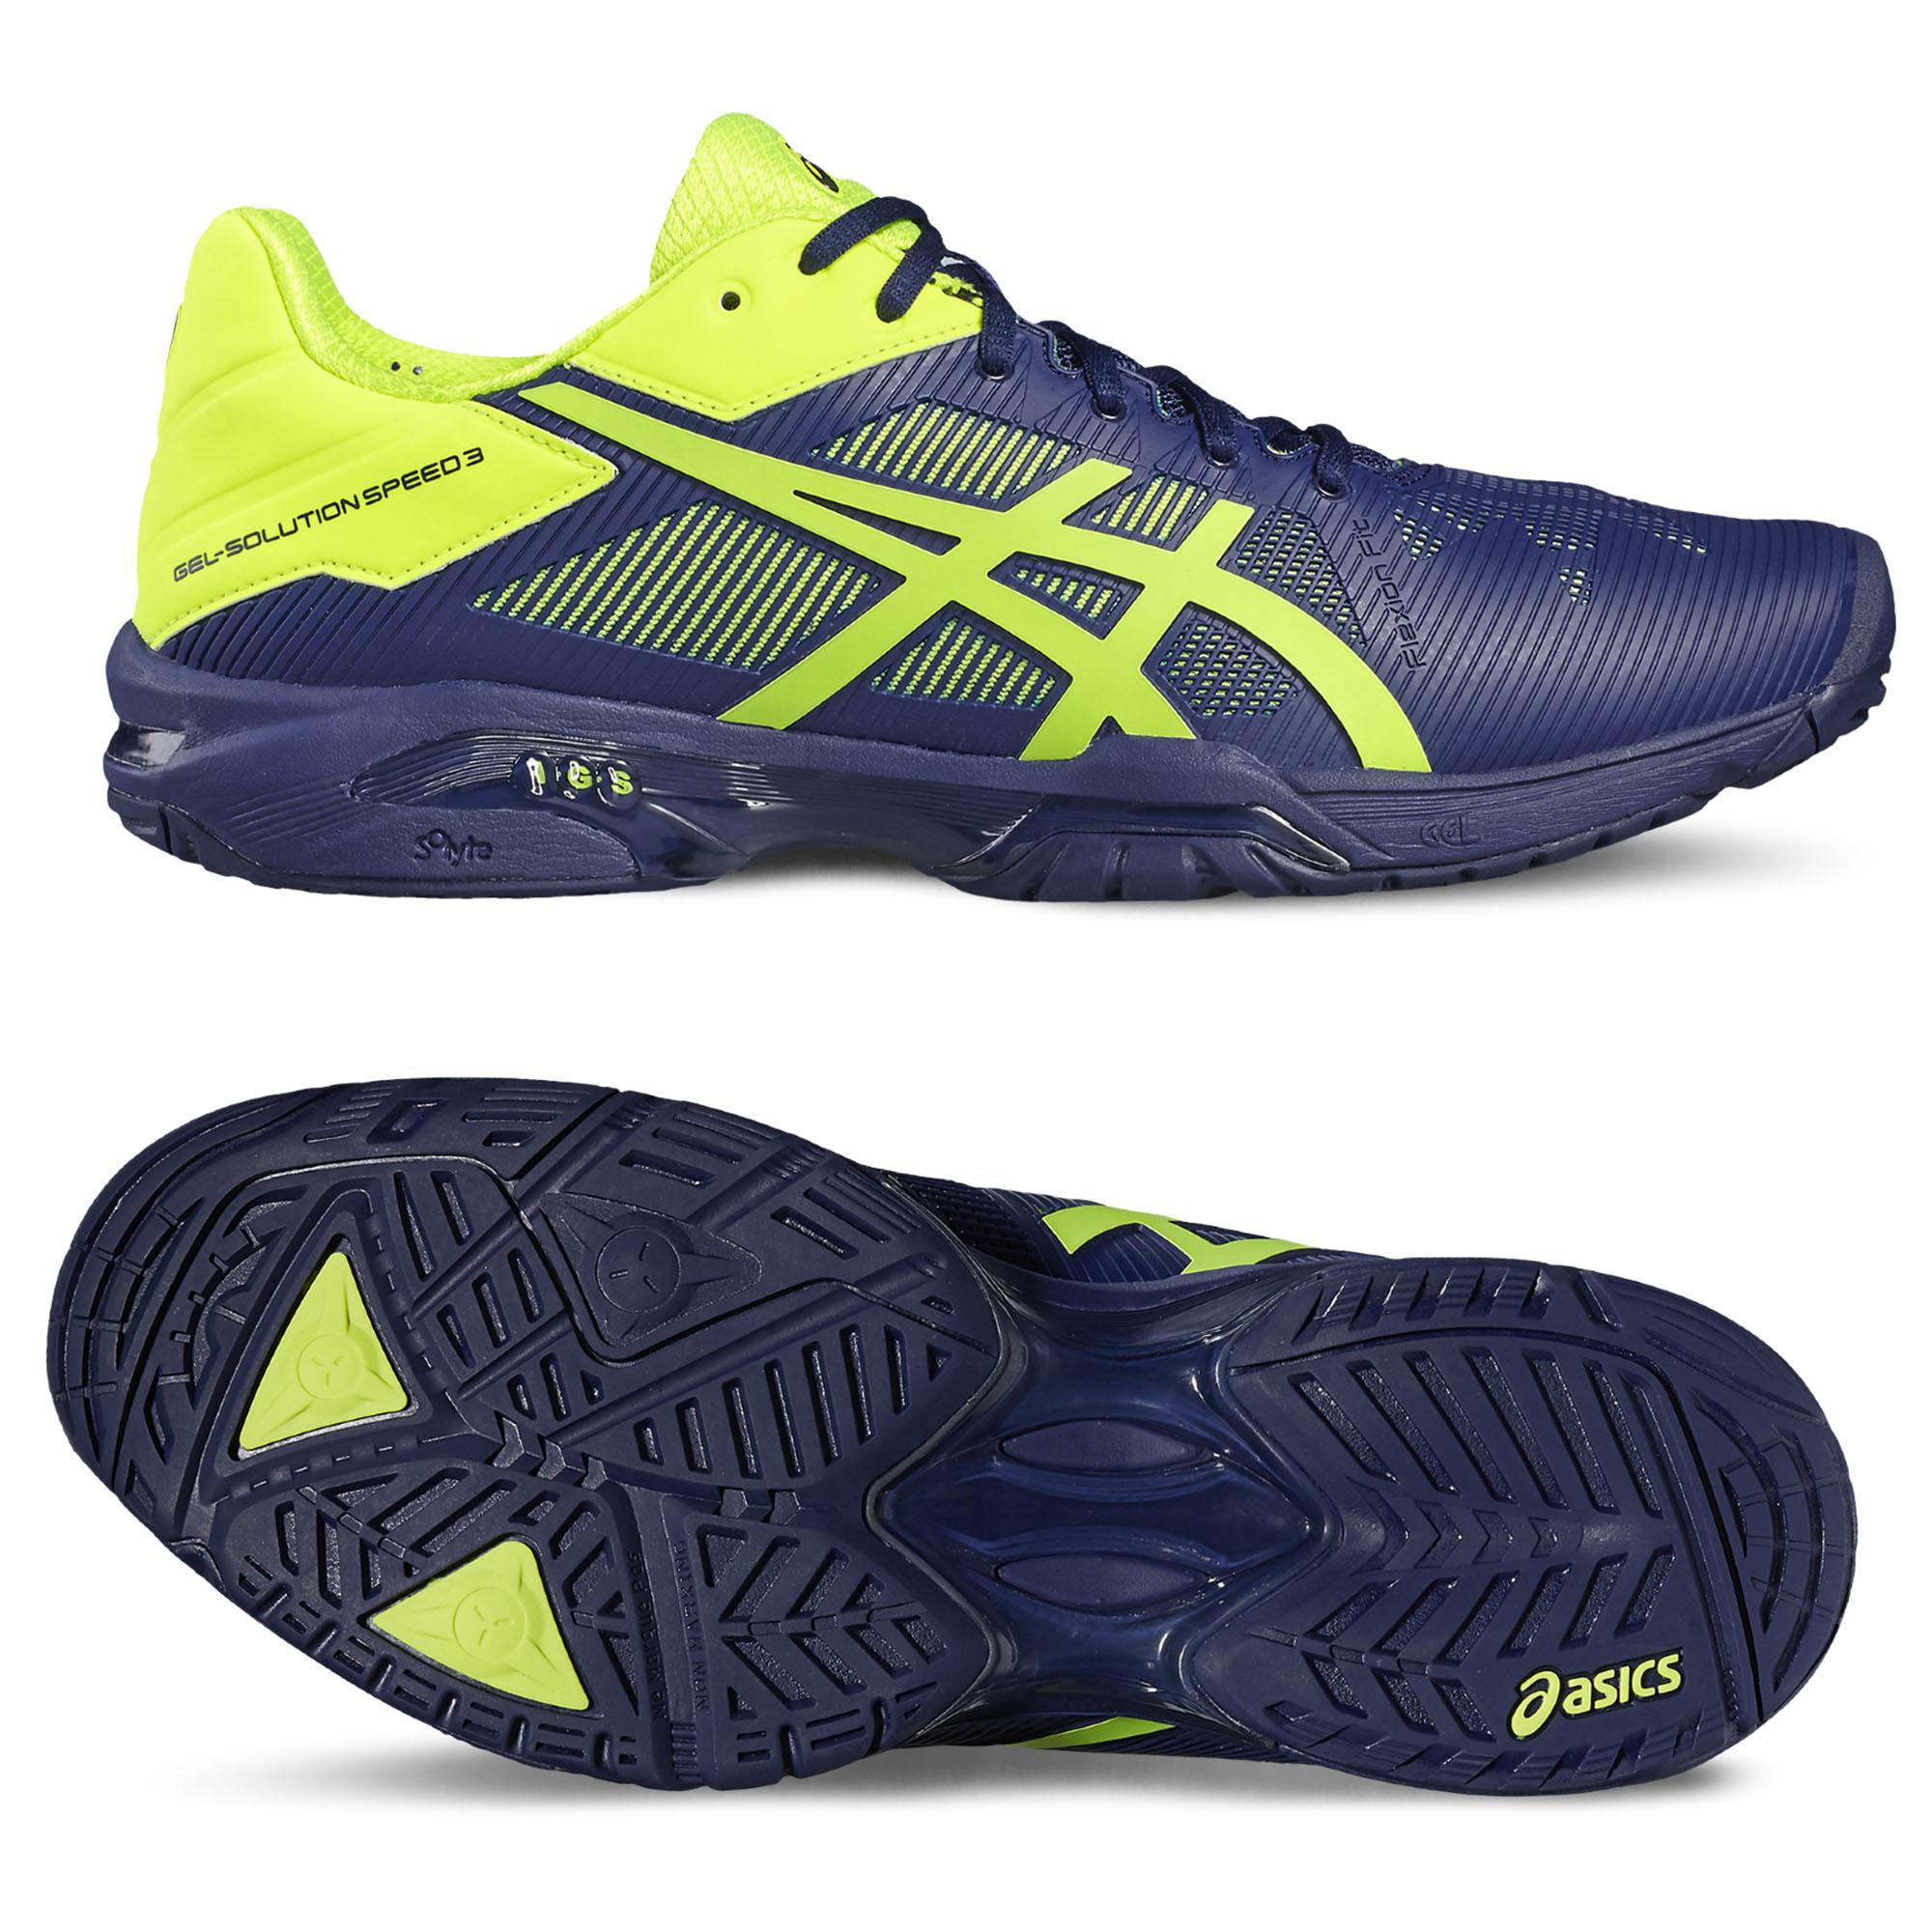 Asics GelSolution Speed 3 Mens Tennis Shoes SS17  11.5 UK